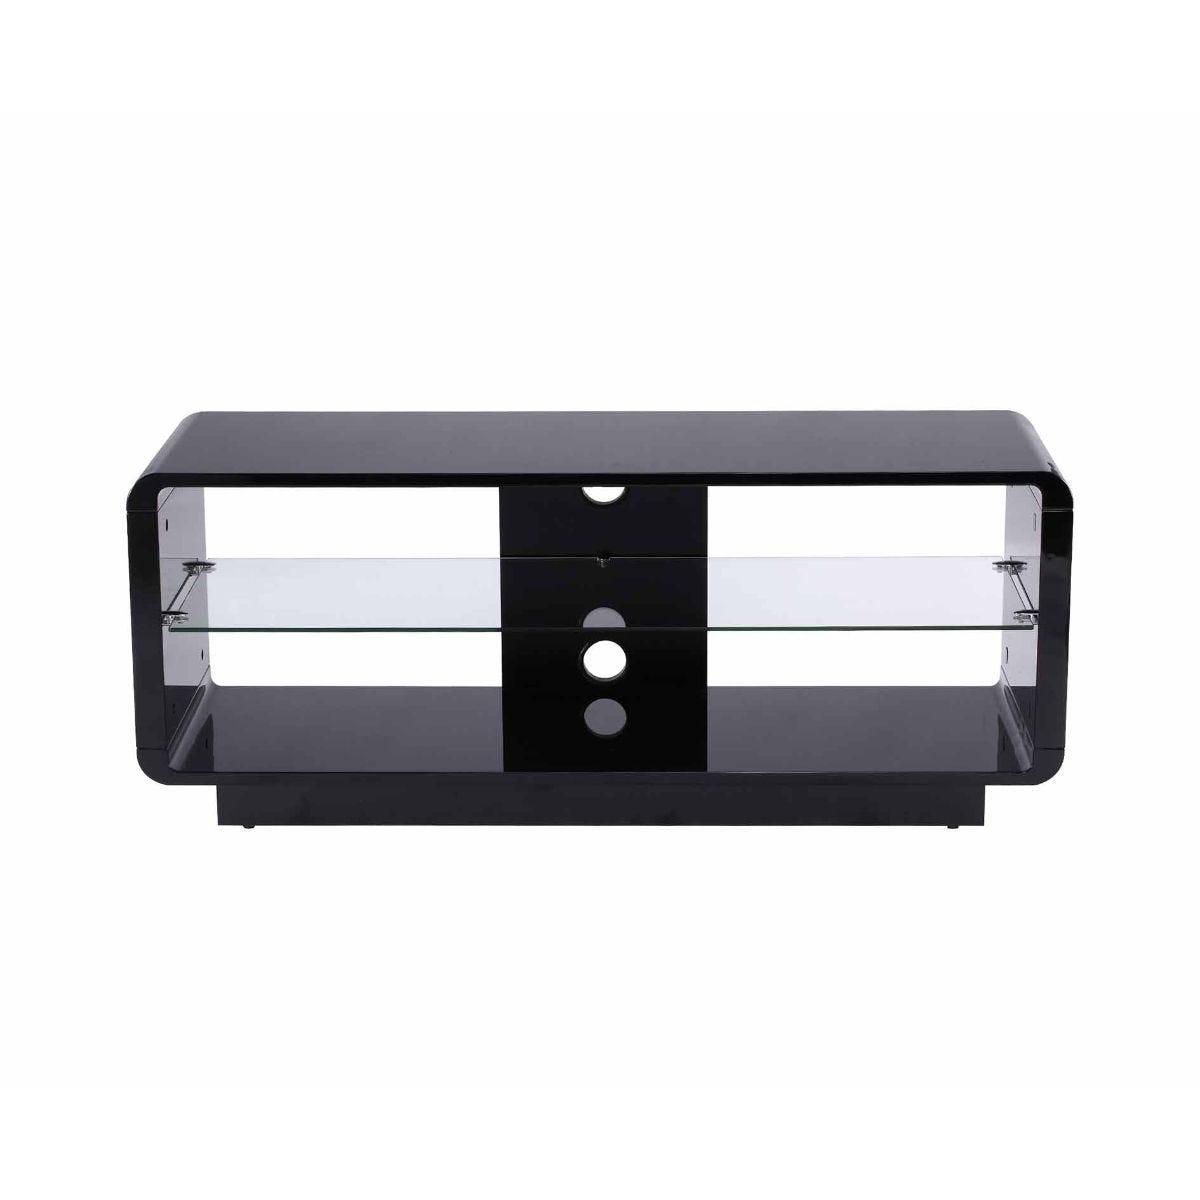 Alphason Luna 1200 TV Stand, Black